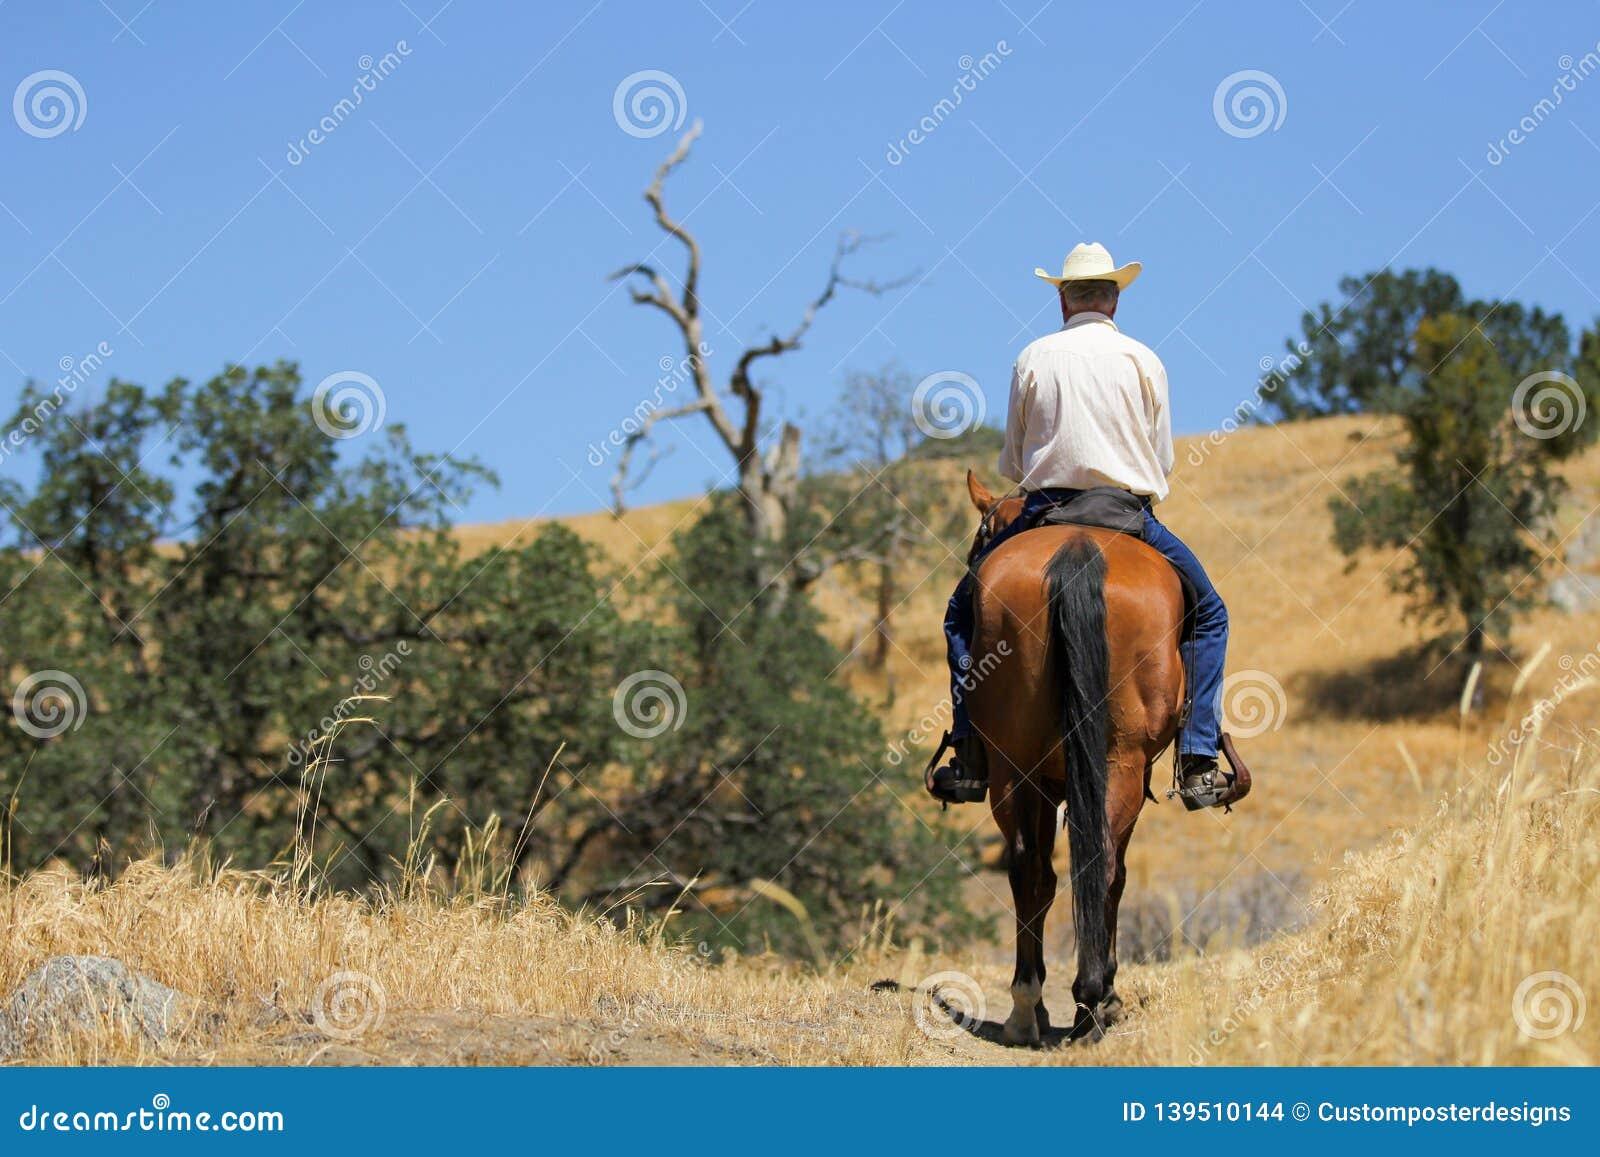 Caballo y vaquero en un rastro de montaña